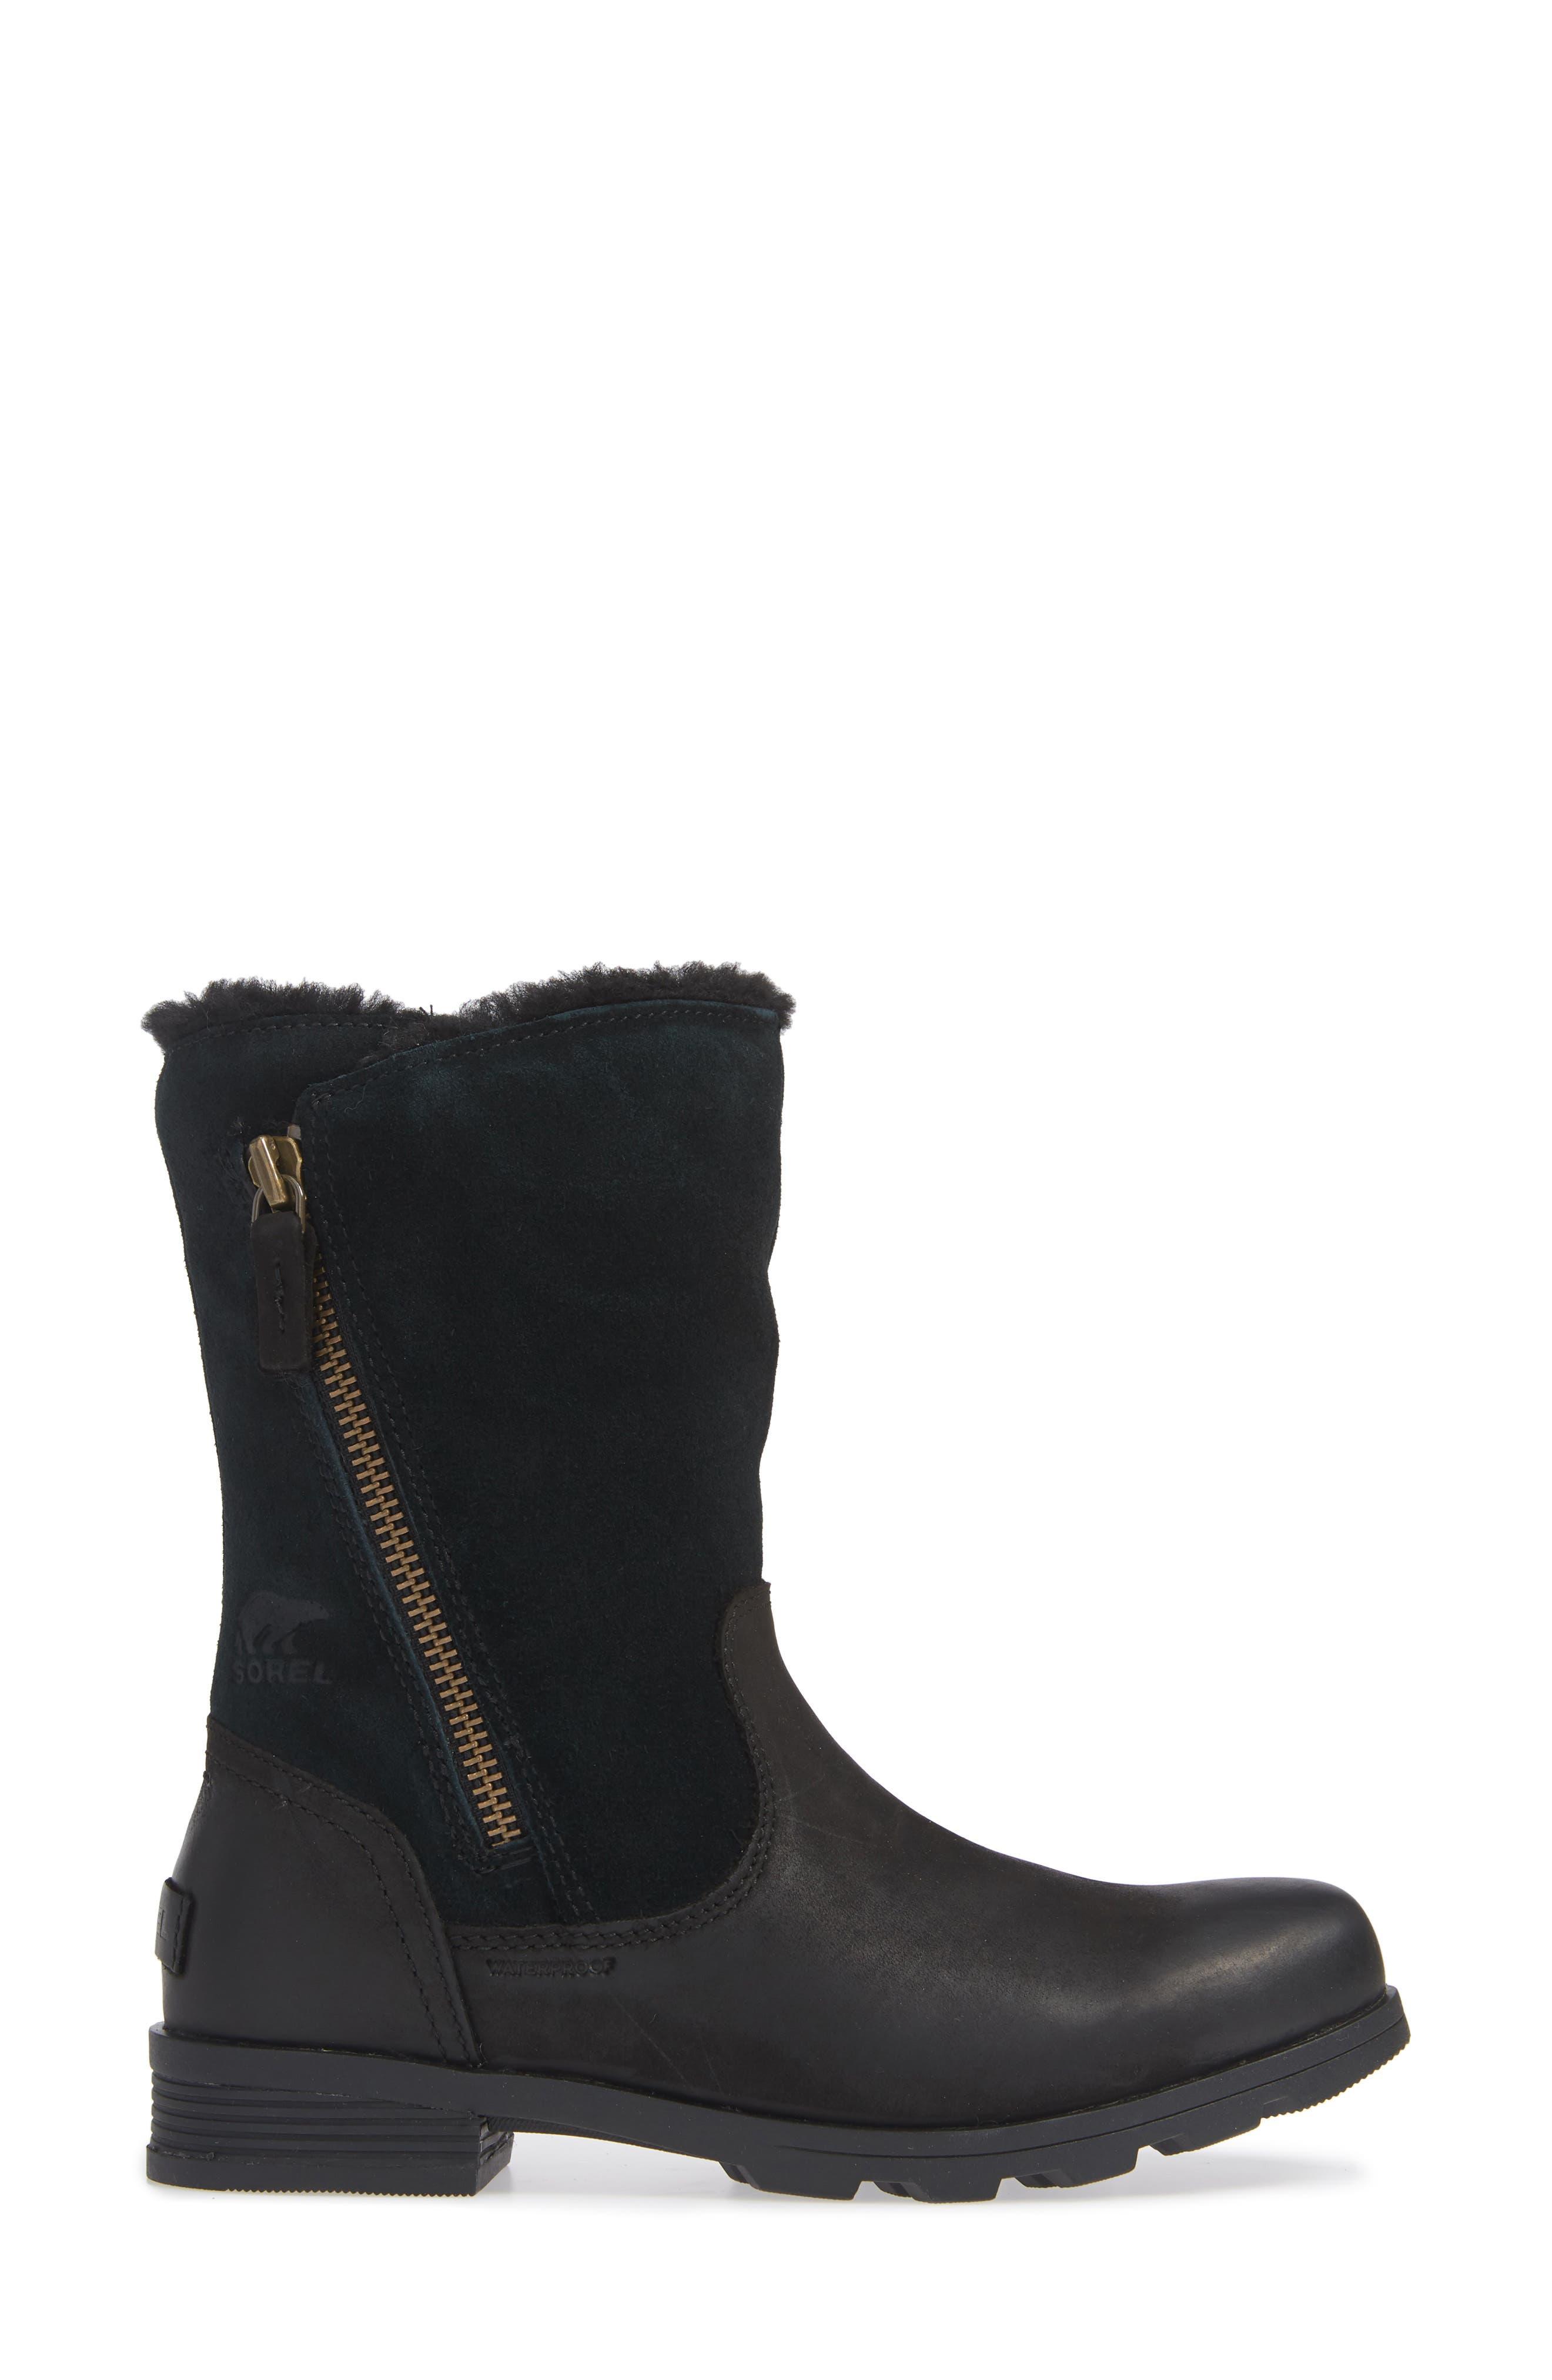 Emelie Waterproof Faux Fur Lined Boot,                             Alternate thumbnail 3, color,                             BLACK